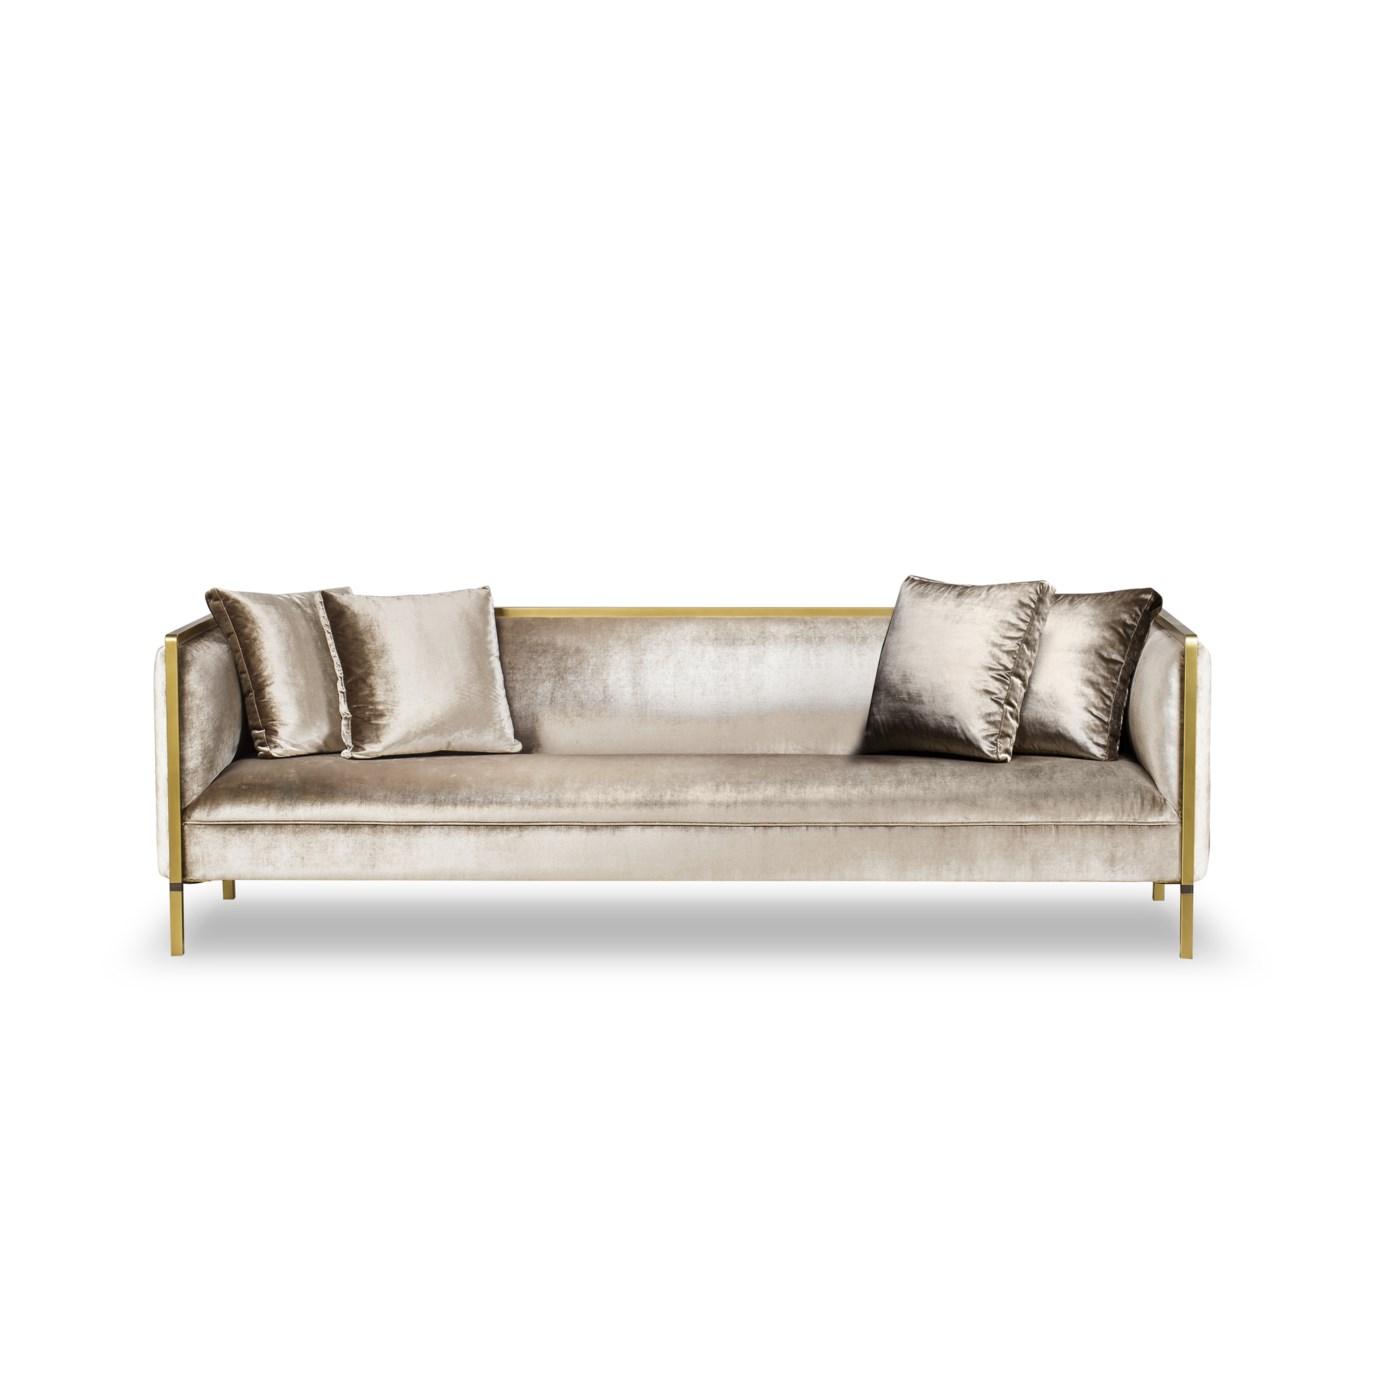 Jeeves Sofa - Large / Moki Fabric